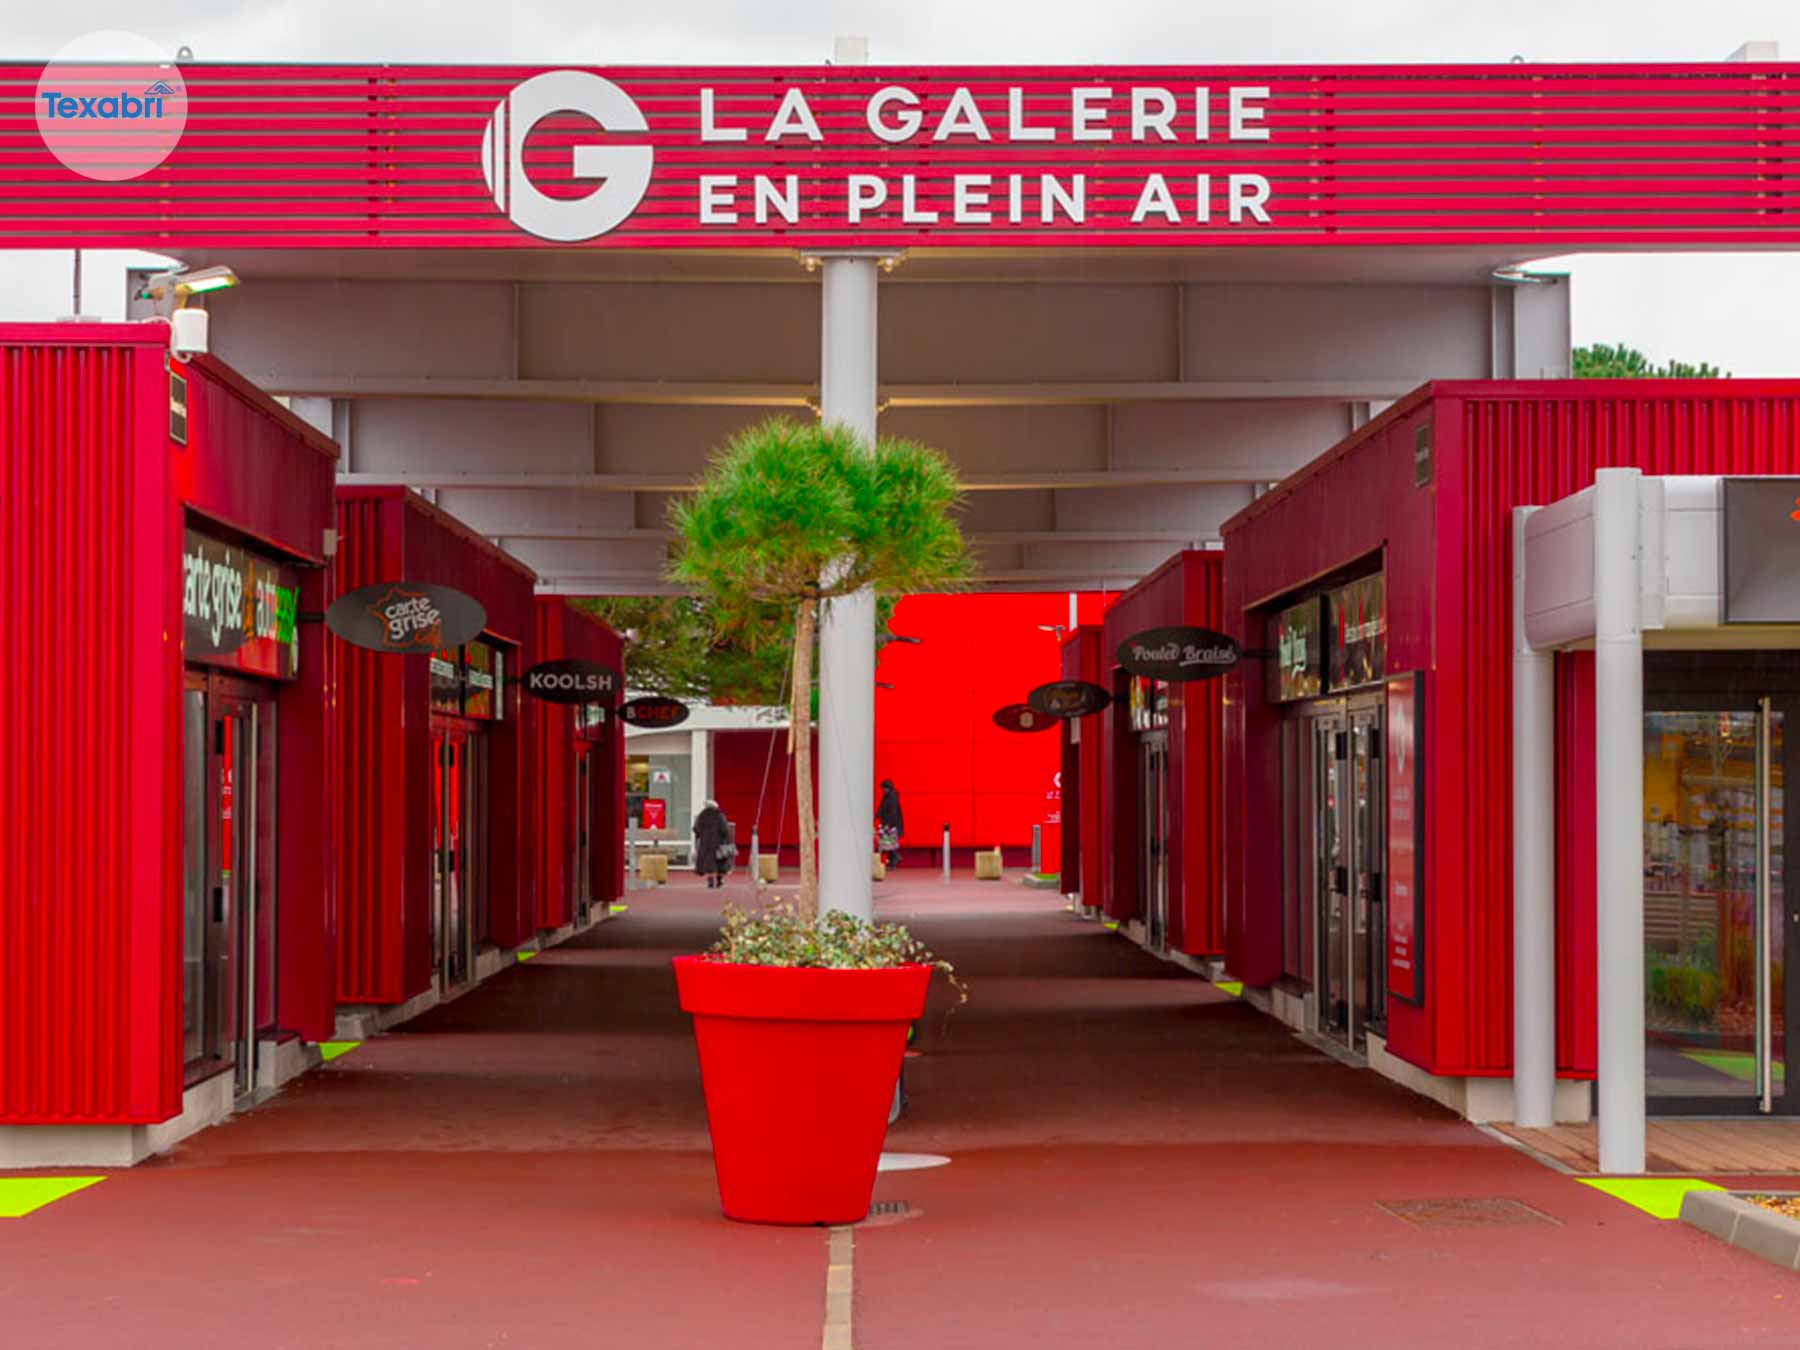 abri-galerie-commerciale